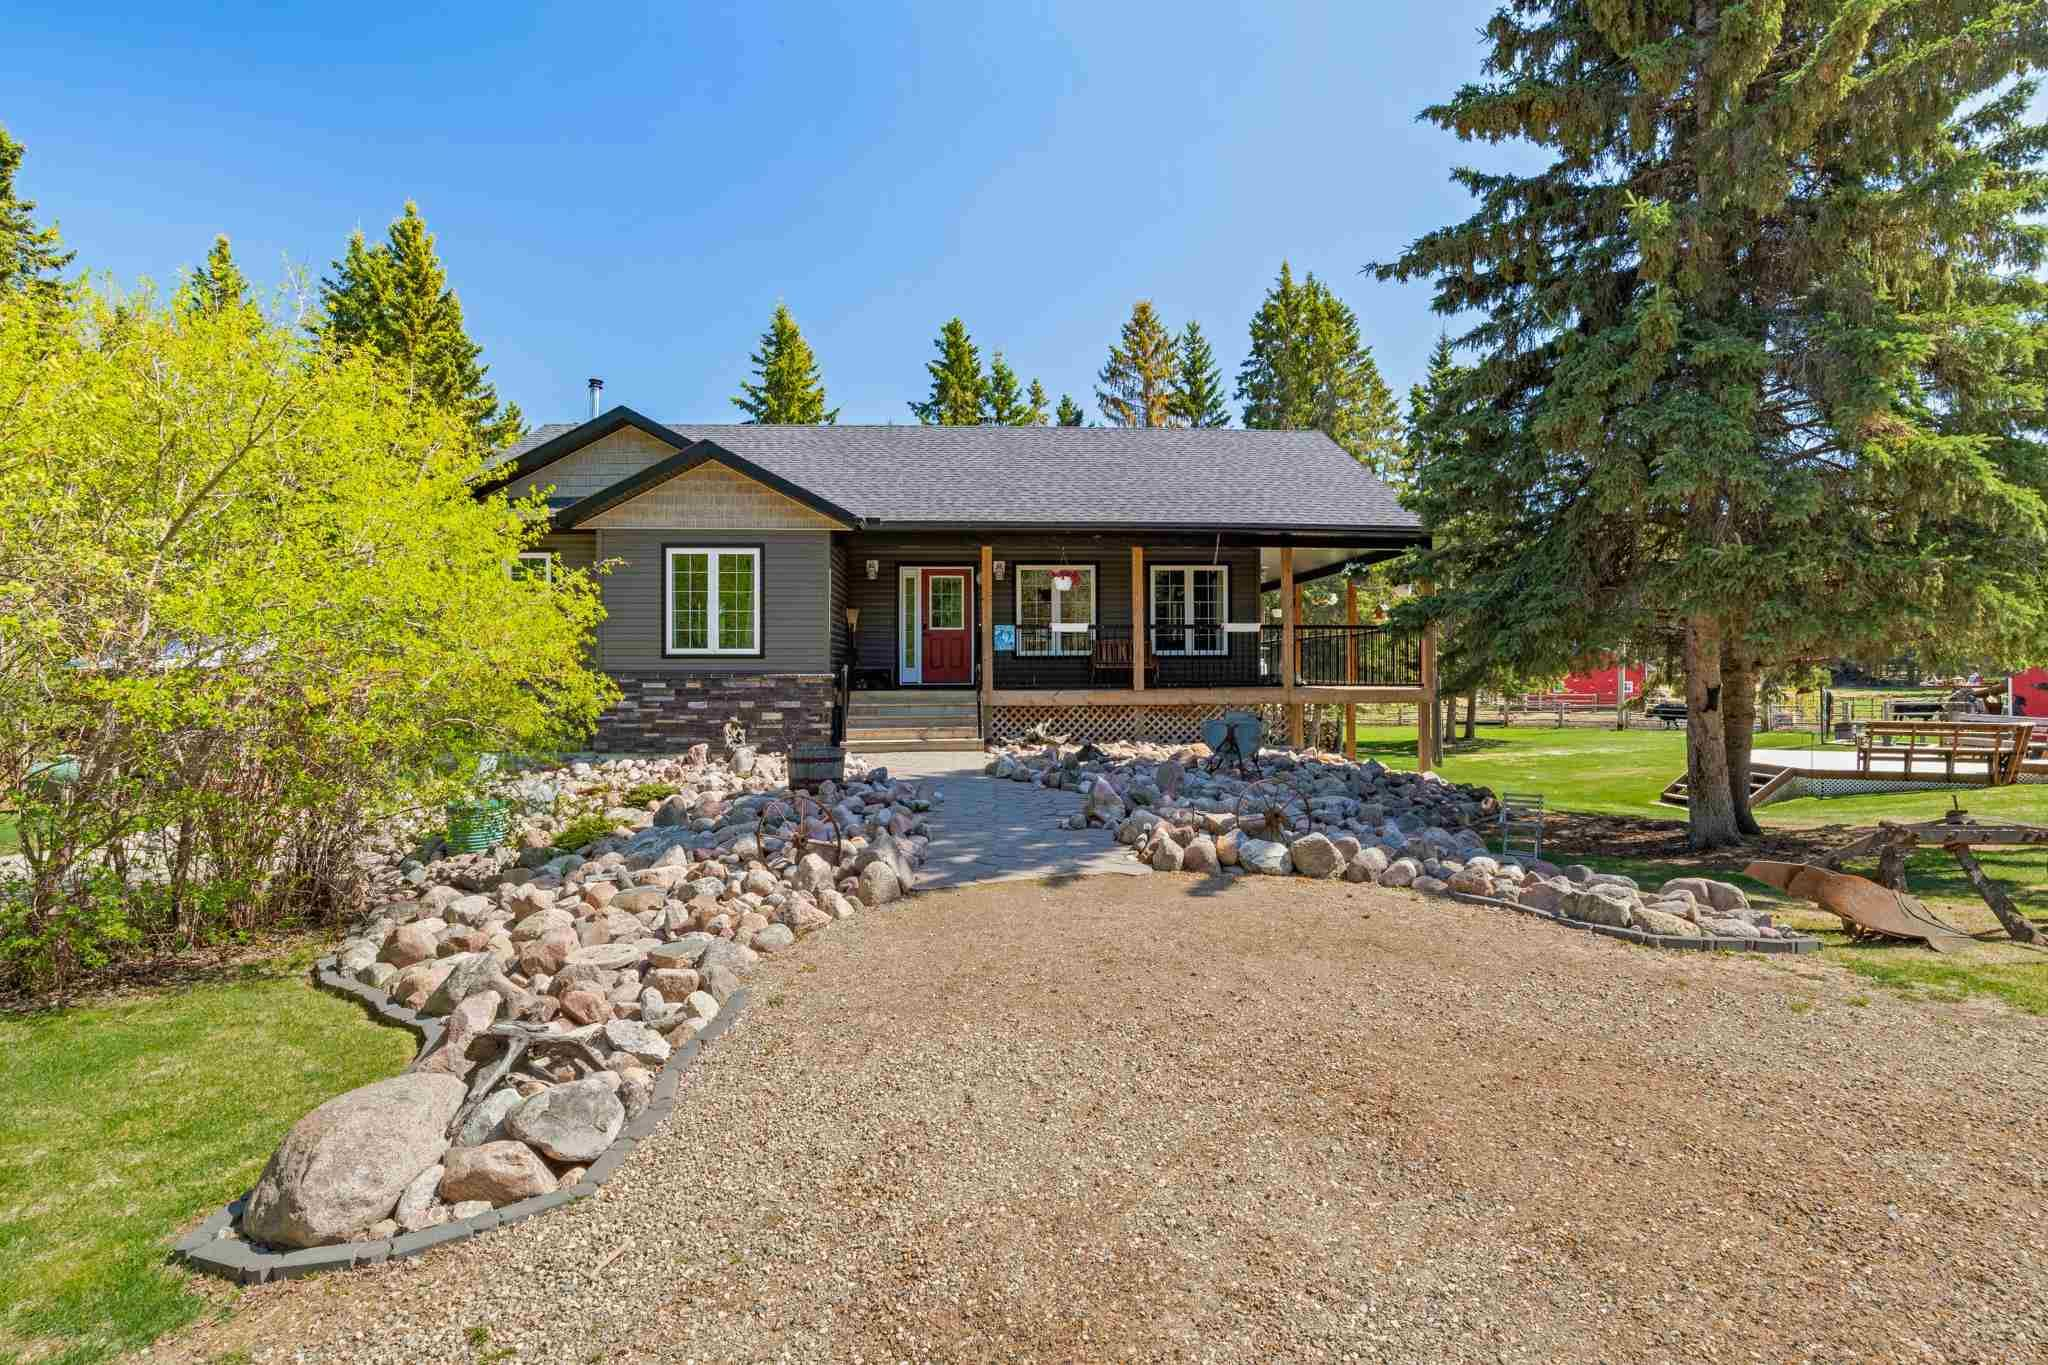 Main Photo: 61427 Rge Rd 422: Rural Bonnyville M.D. House for sale : MLS®# E4246903